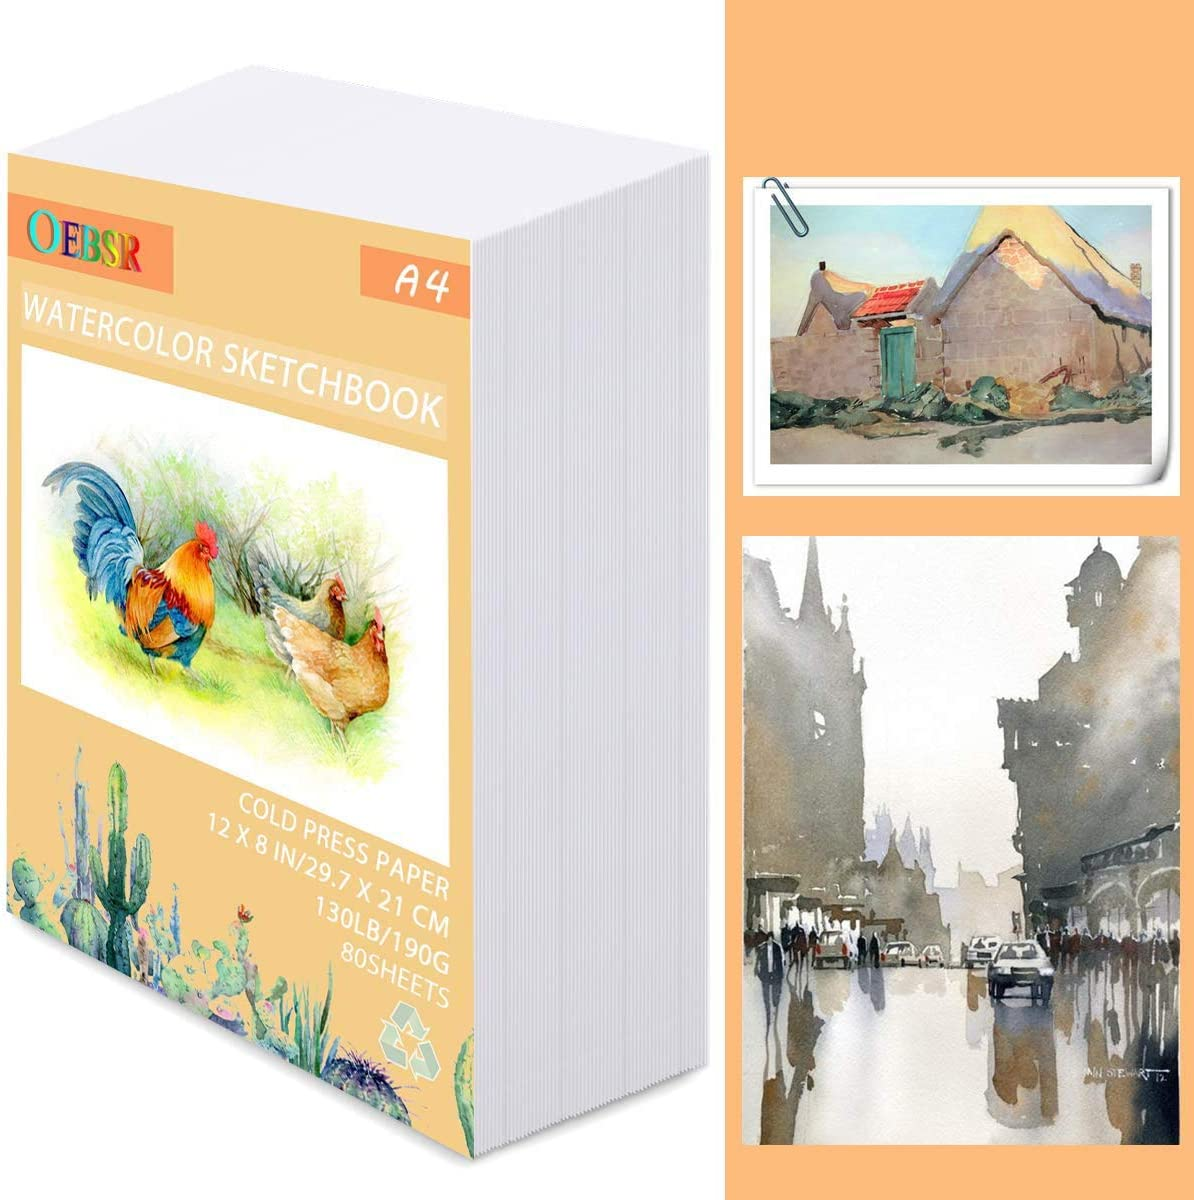 Minneapolis Mall Fyess 80 Latest item Sheet A4 White Watercolor Cut Press 130 Paper Bulk Cold